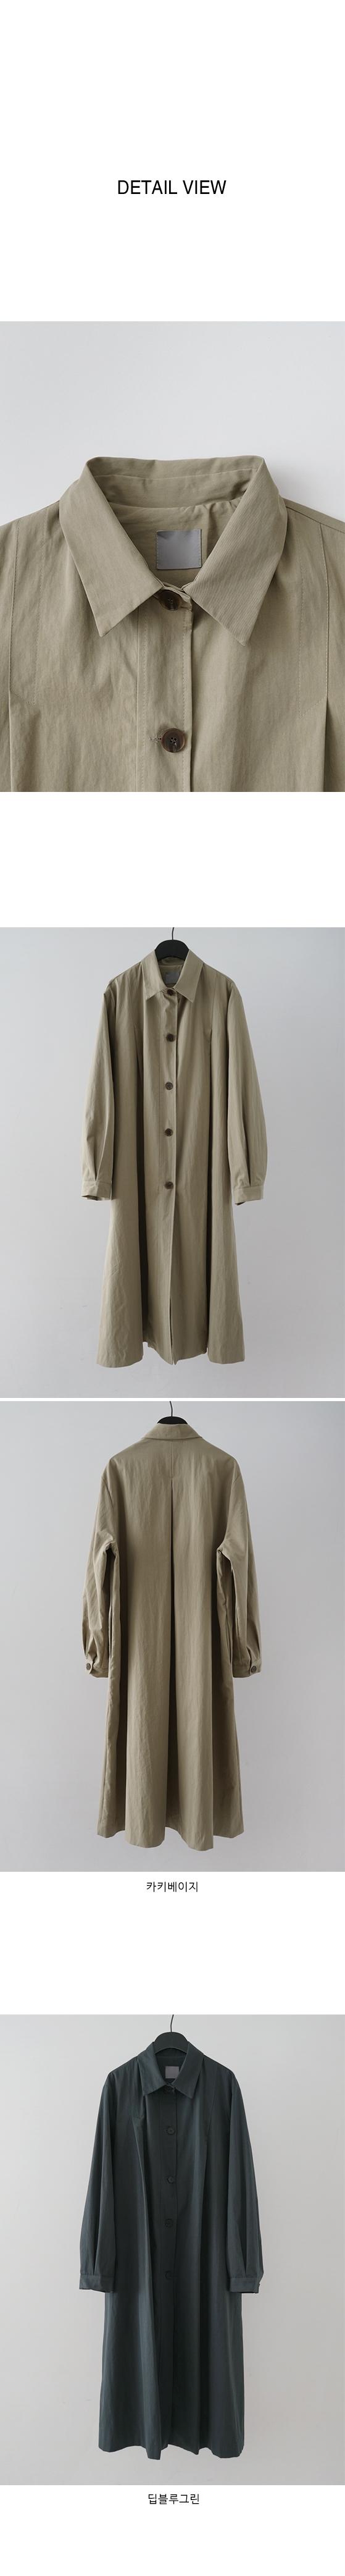 matt washing trench coat